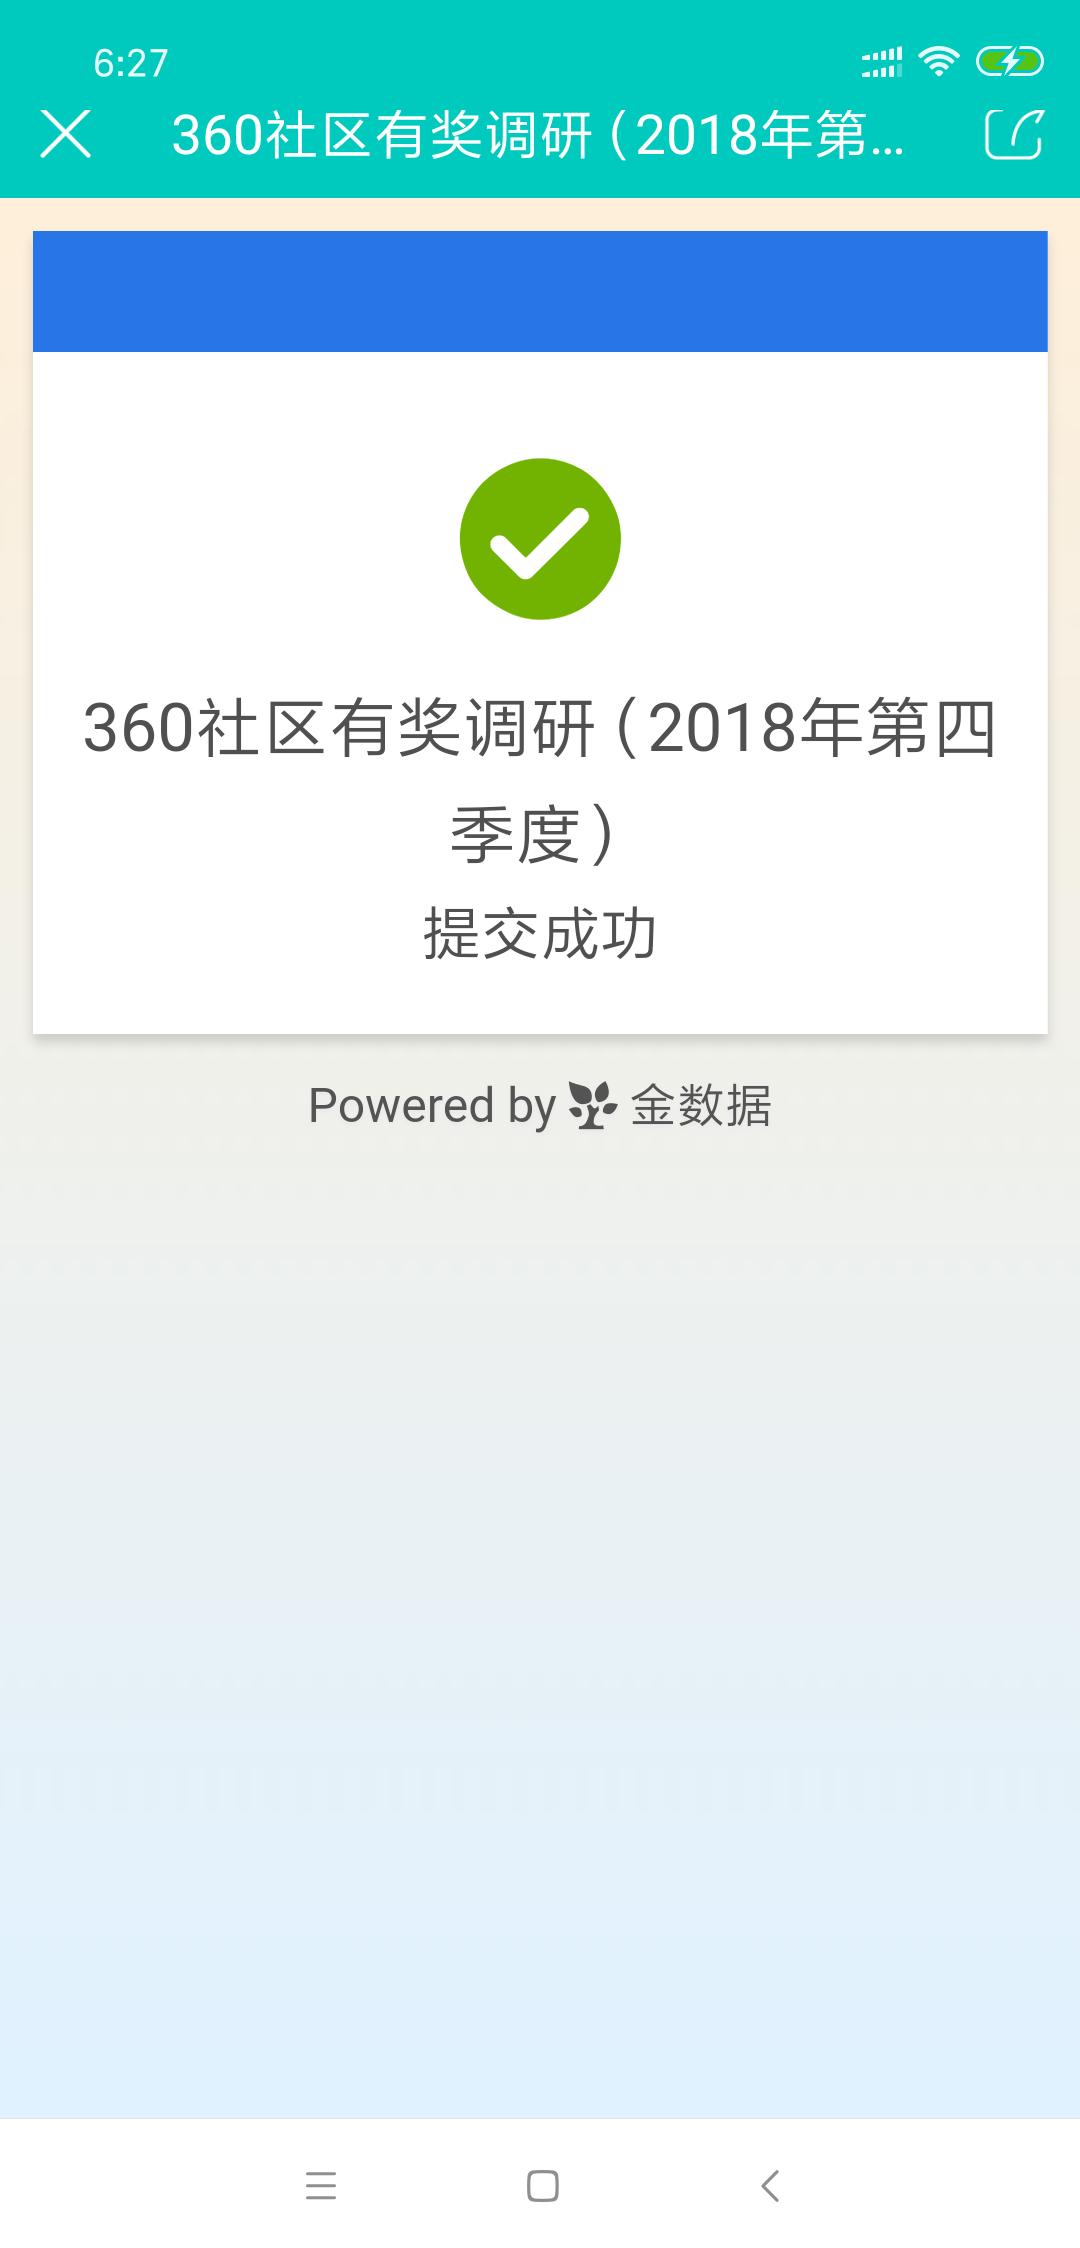 Screenshot_2019-01-05-06-27-54-938_com.qiku.bbs.png